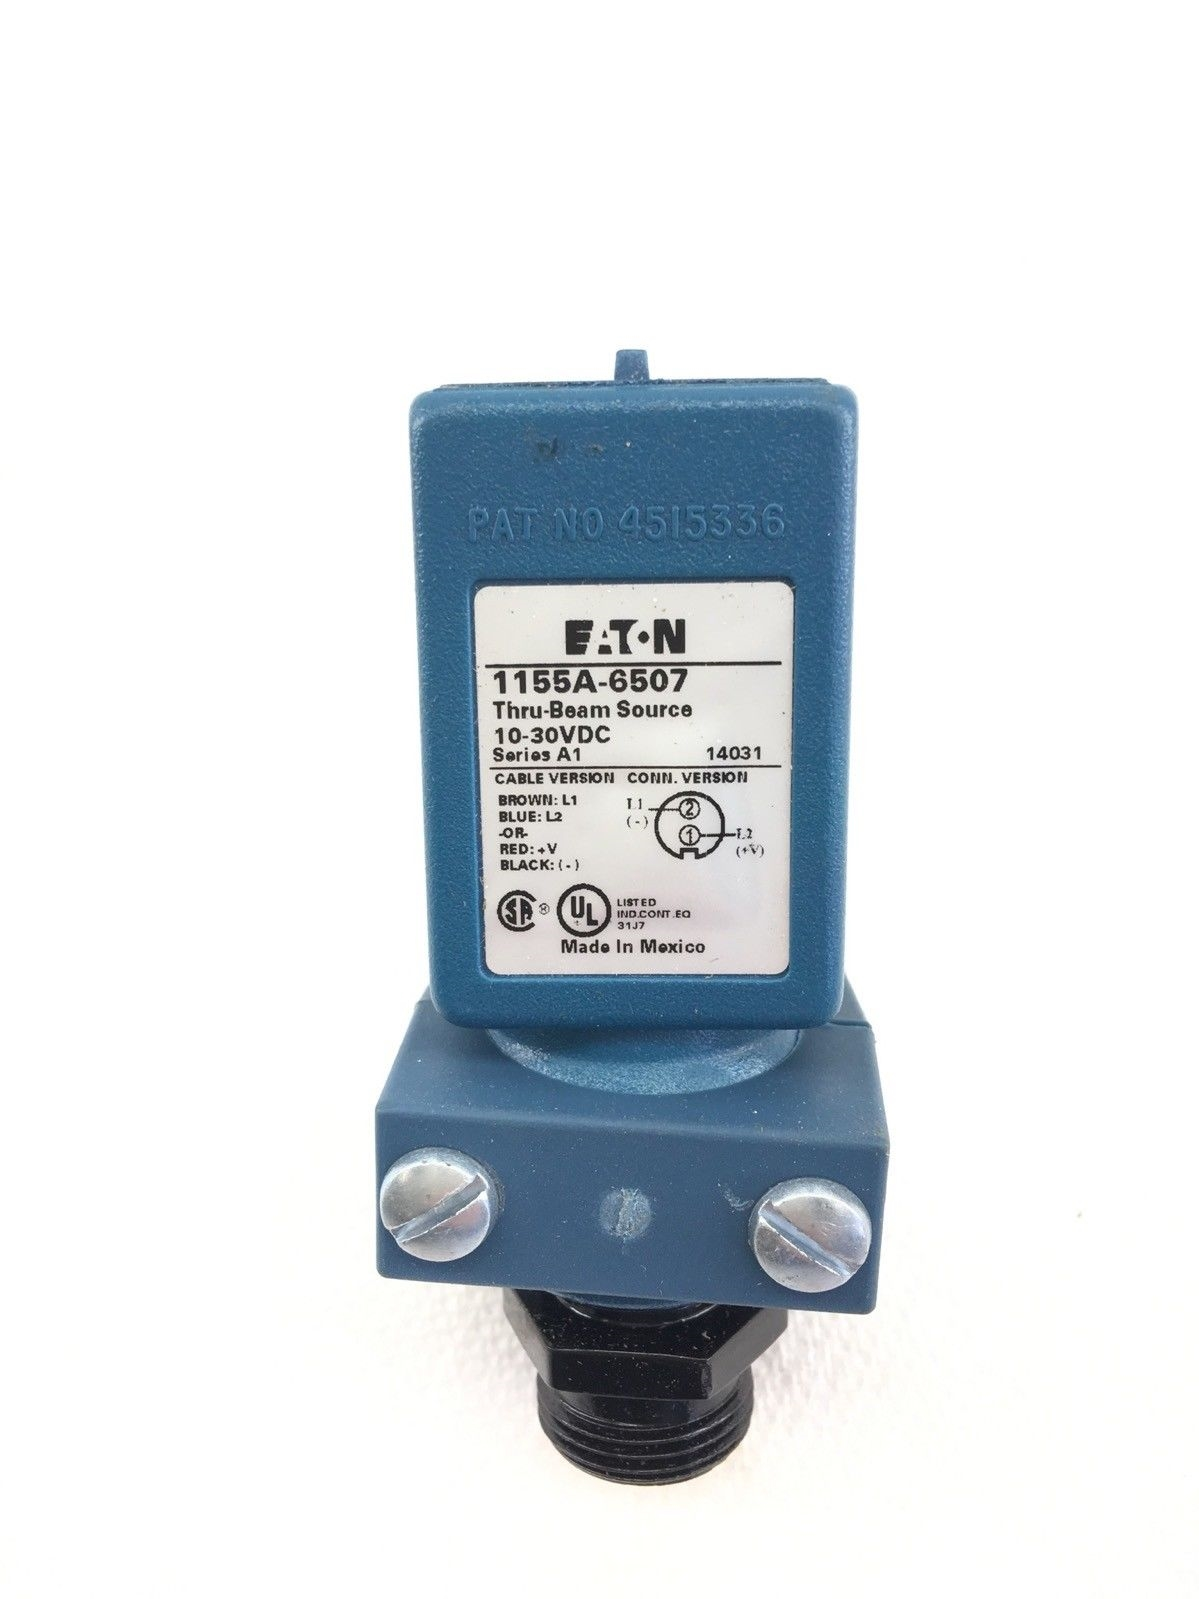 NEW EATON 1155A-6507 THRU-BEAM SOURCE 10-30VDC SERIES A1, FAST SHIP! (A594) 2